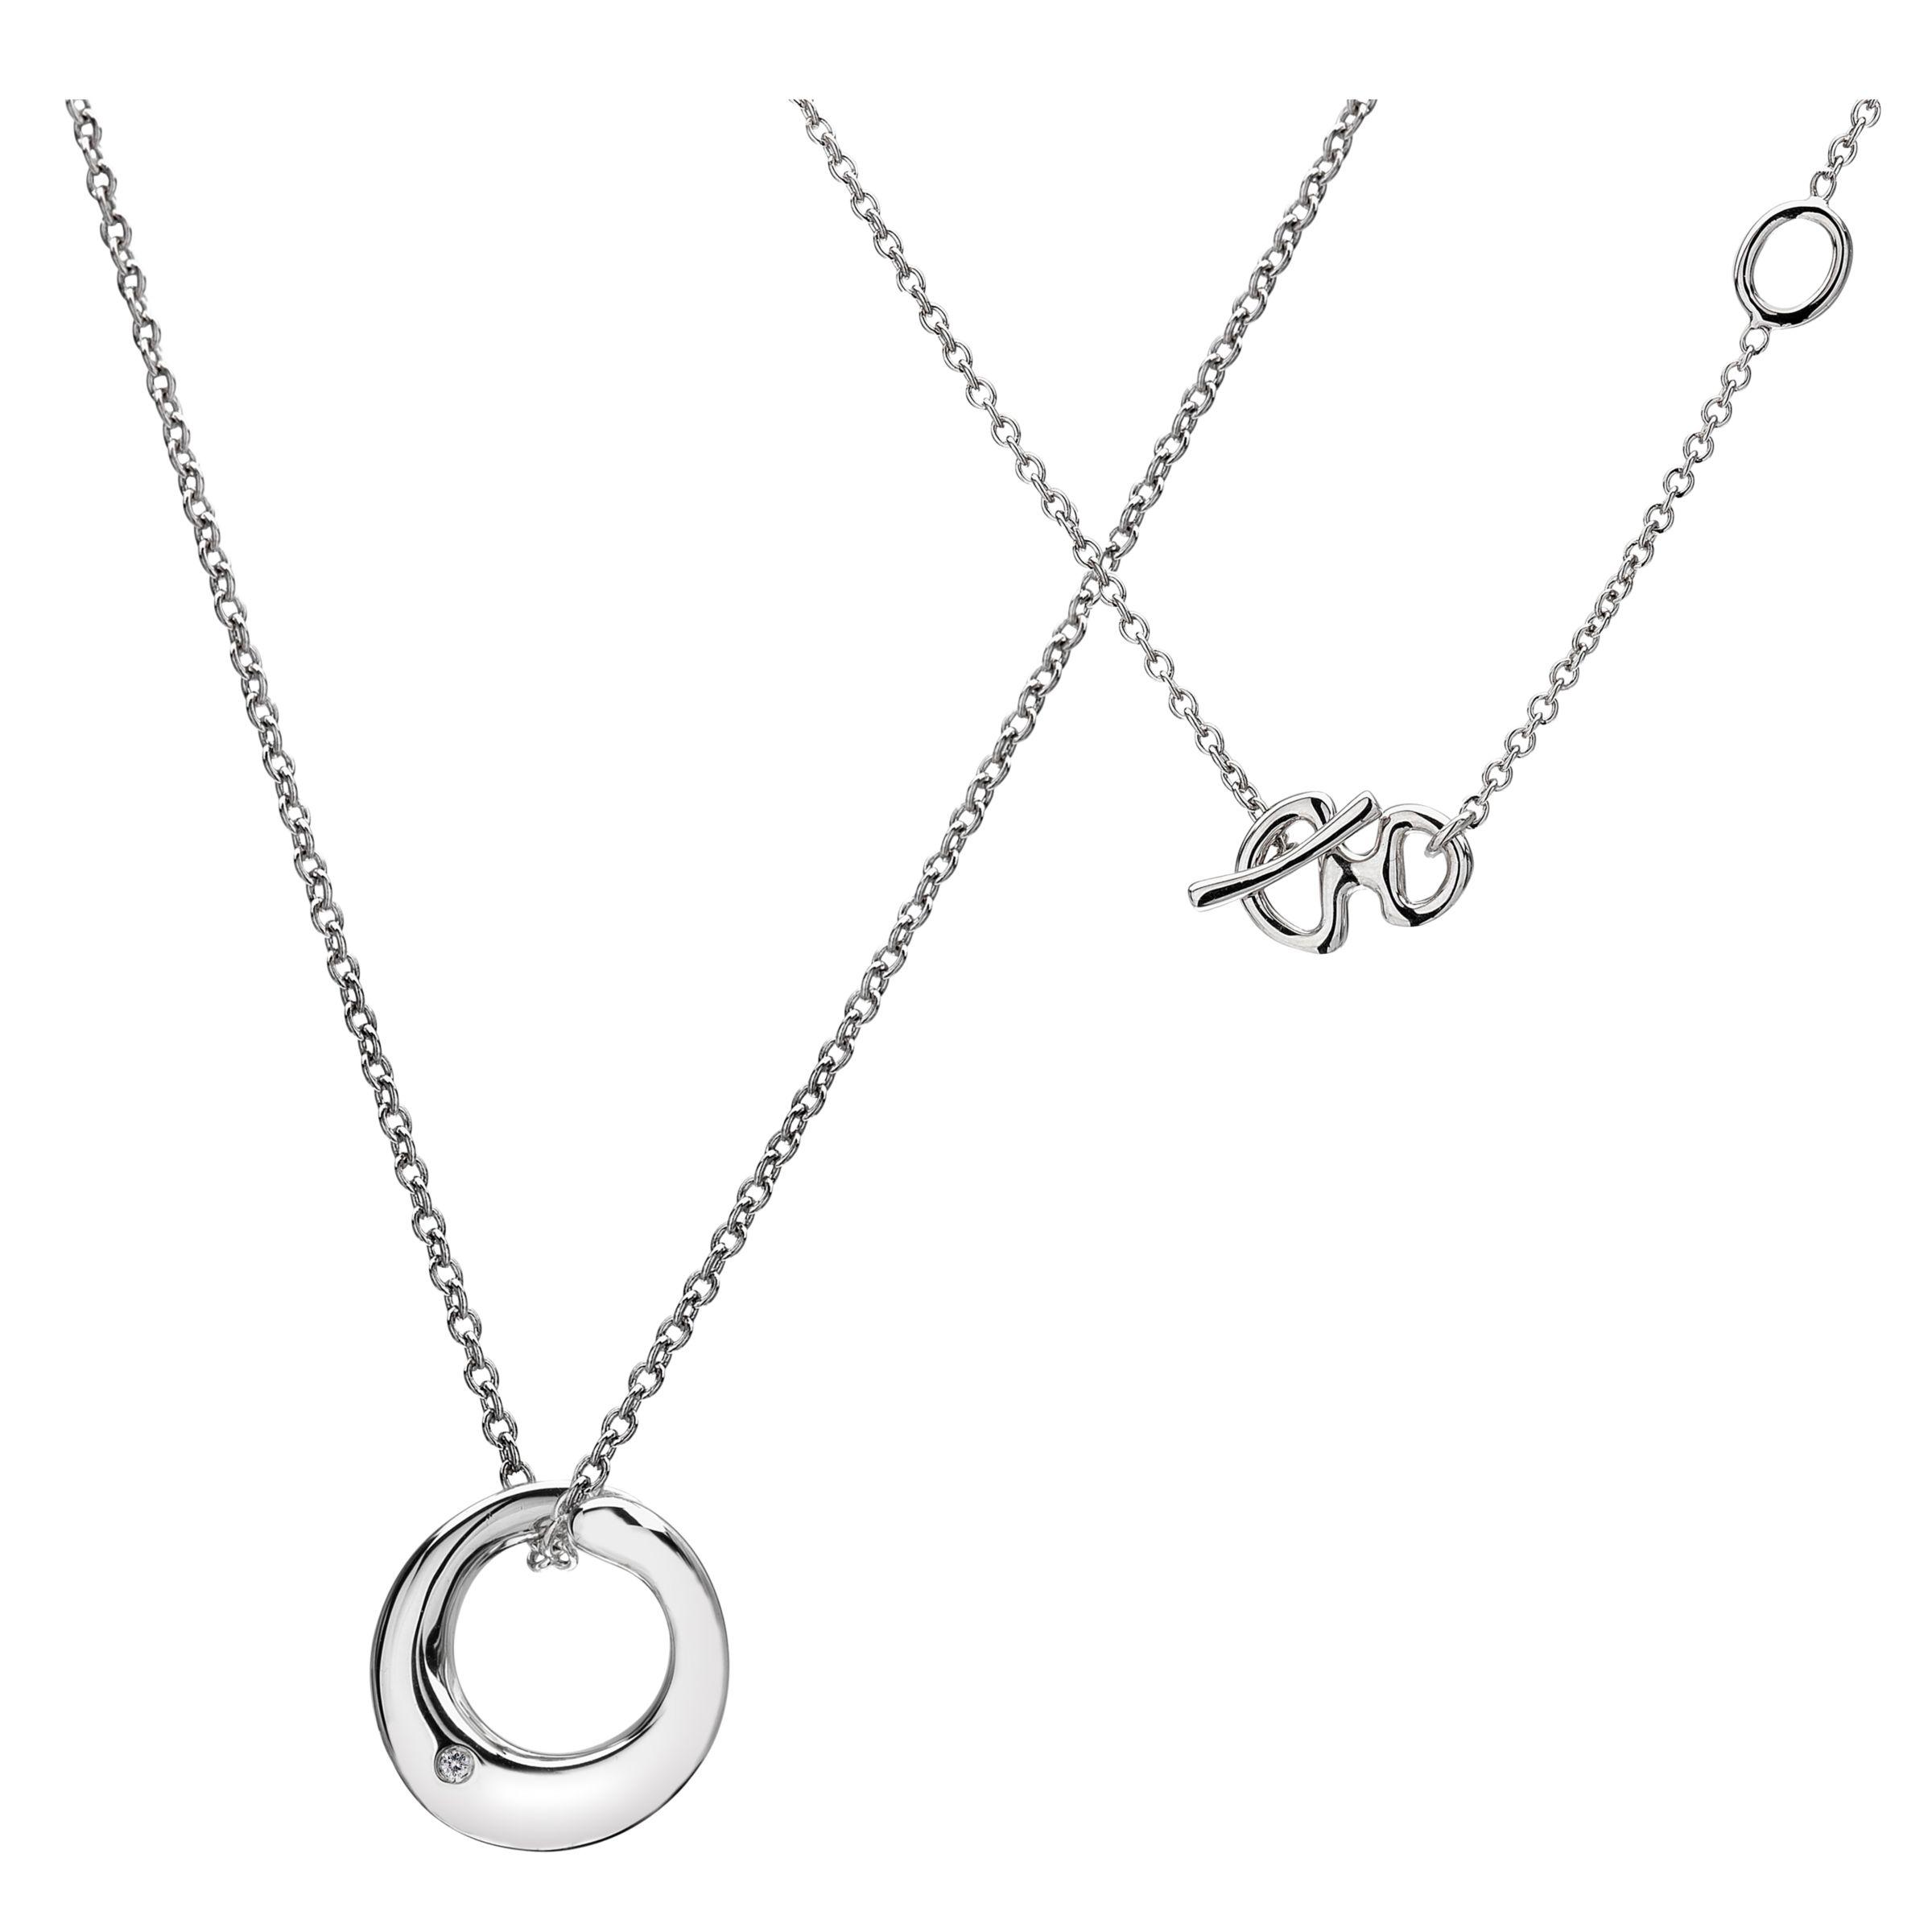 Hot Diamonds Eternal Mini Pendant Necklace